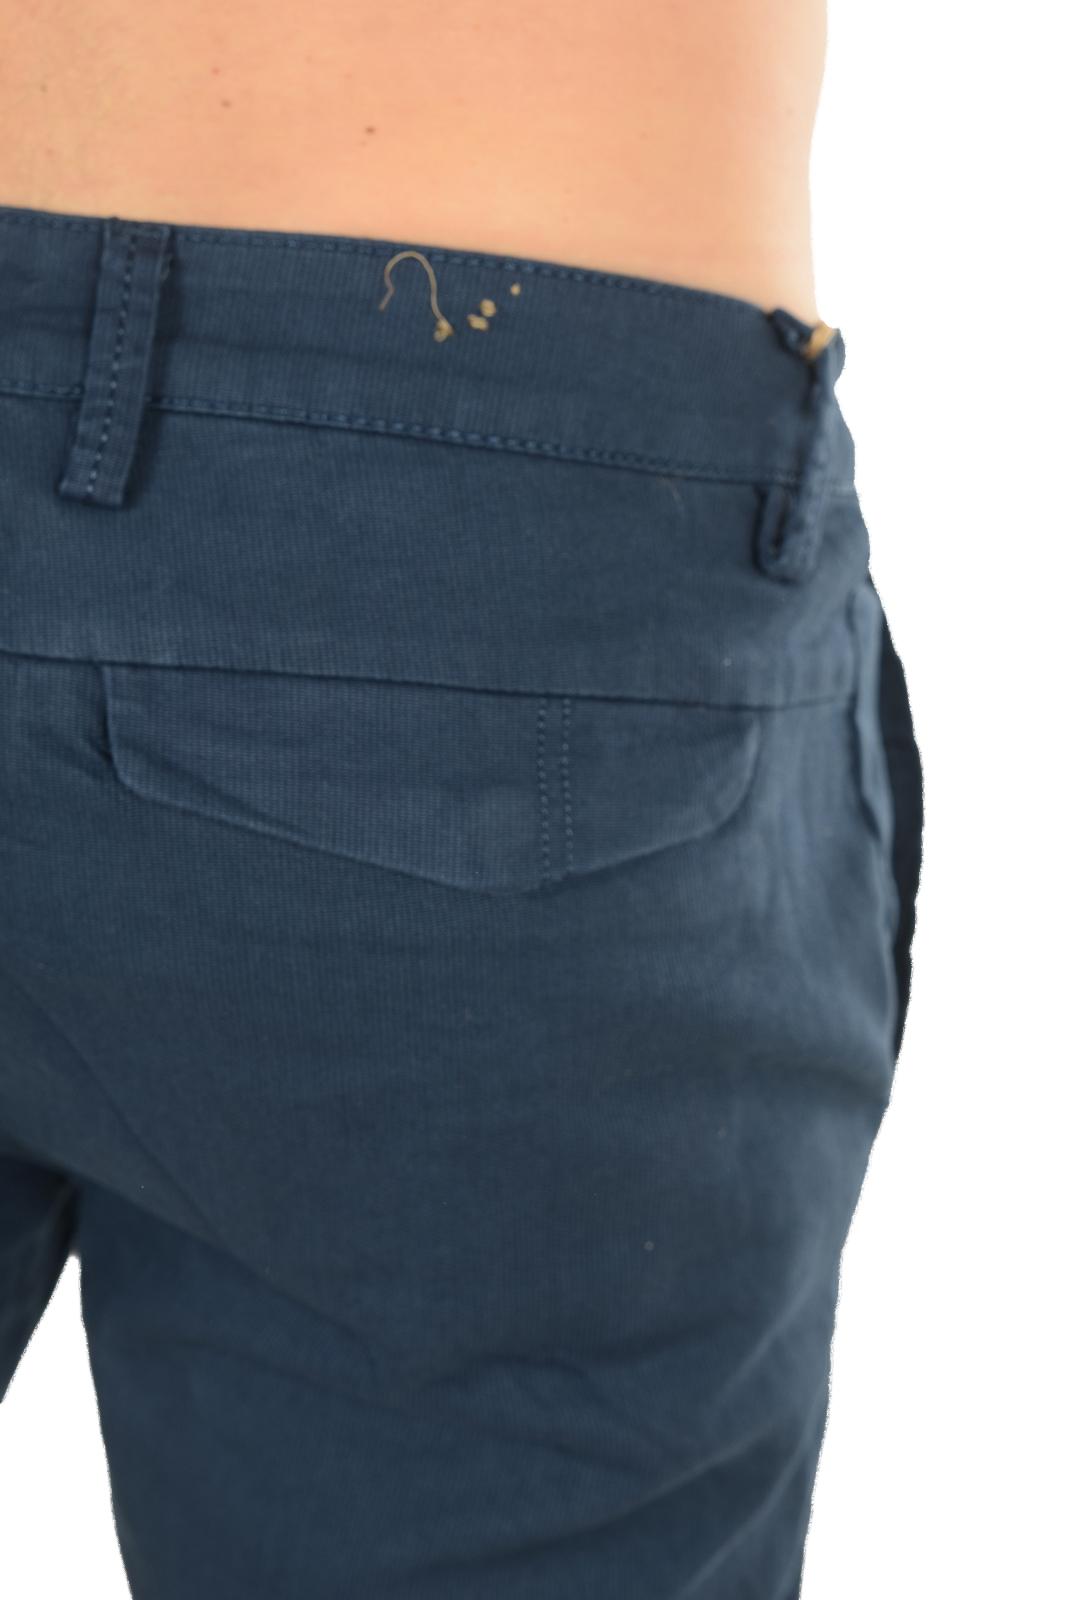 Pantalons chino/citadin  Giani 5 9236A BLEU